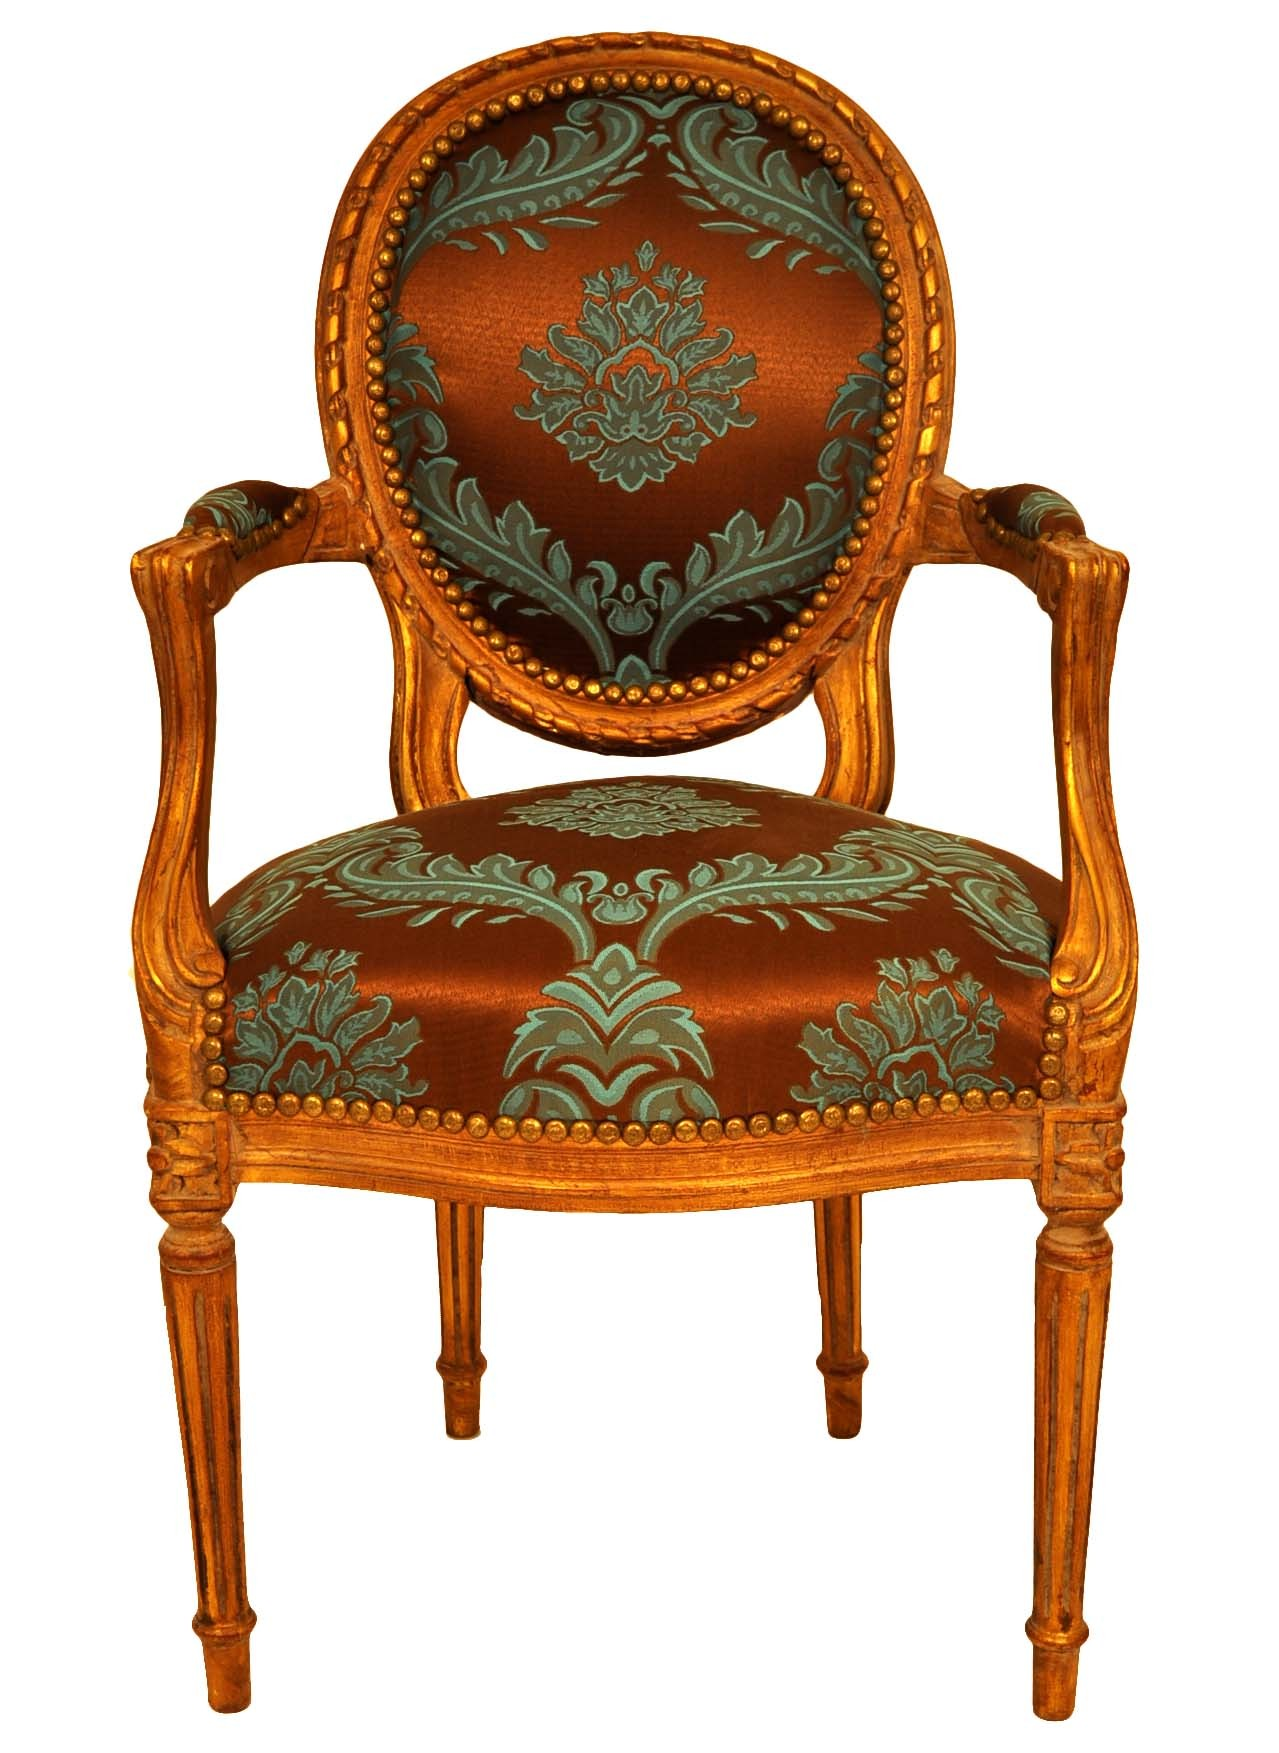 fauteuil cabriolet turquoise demeure et jardin. Black Bedroom Furniture Sets. Home Design Ideas